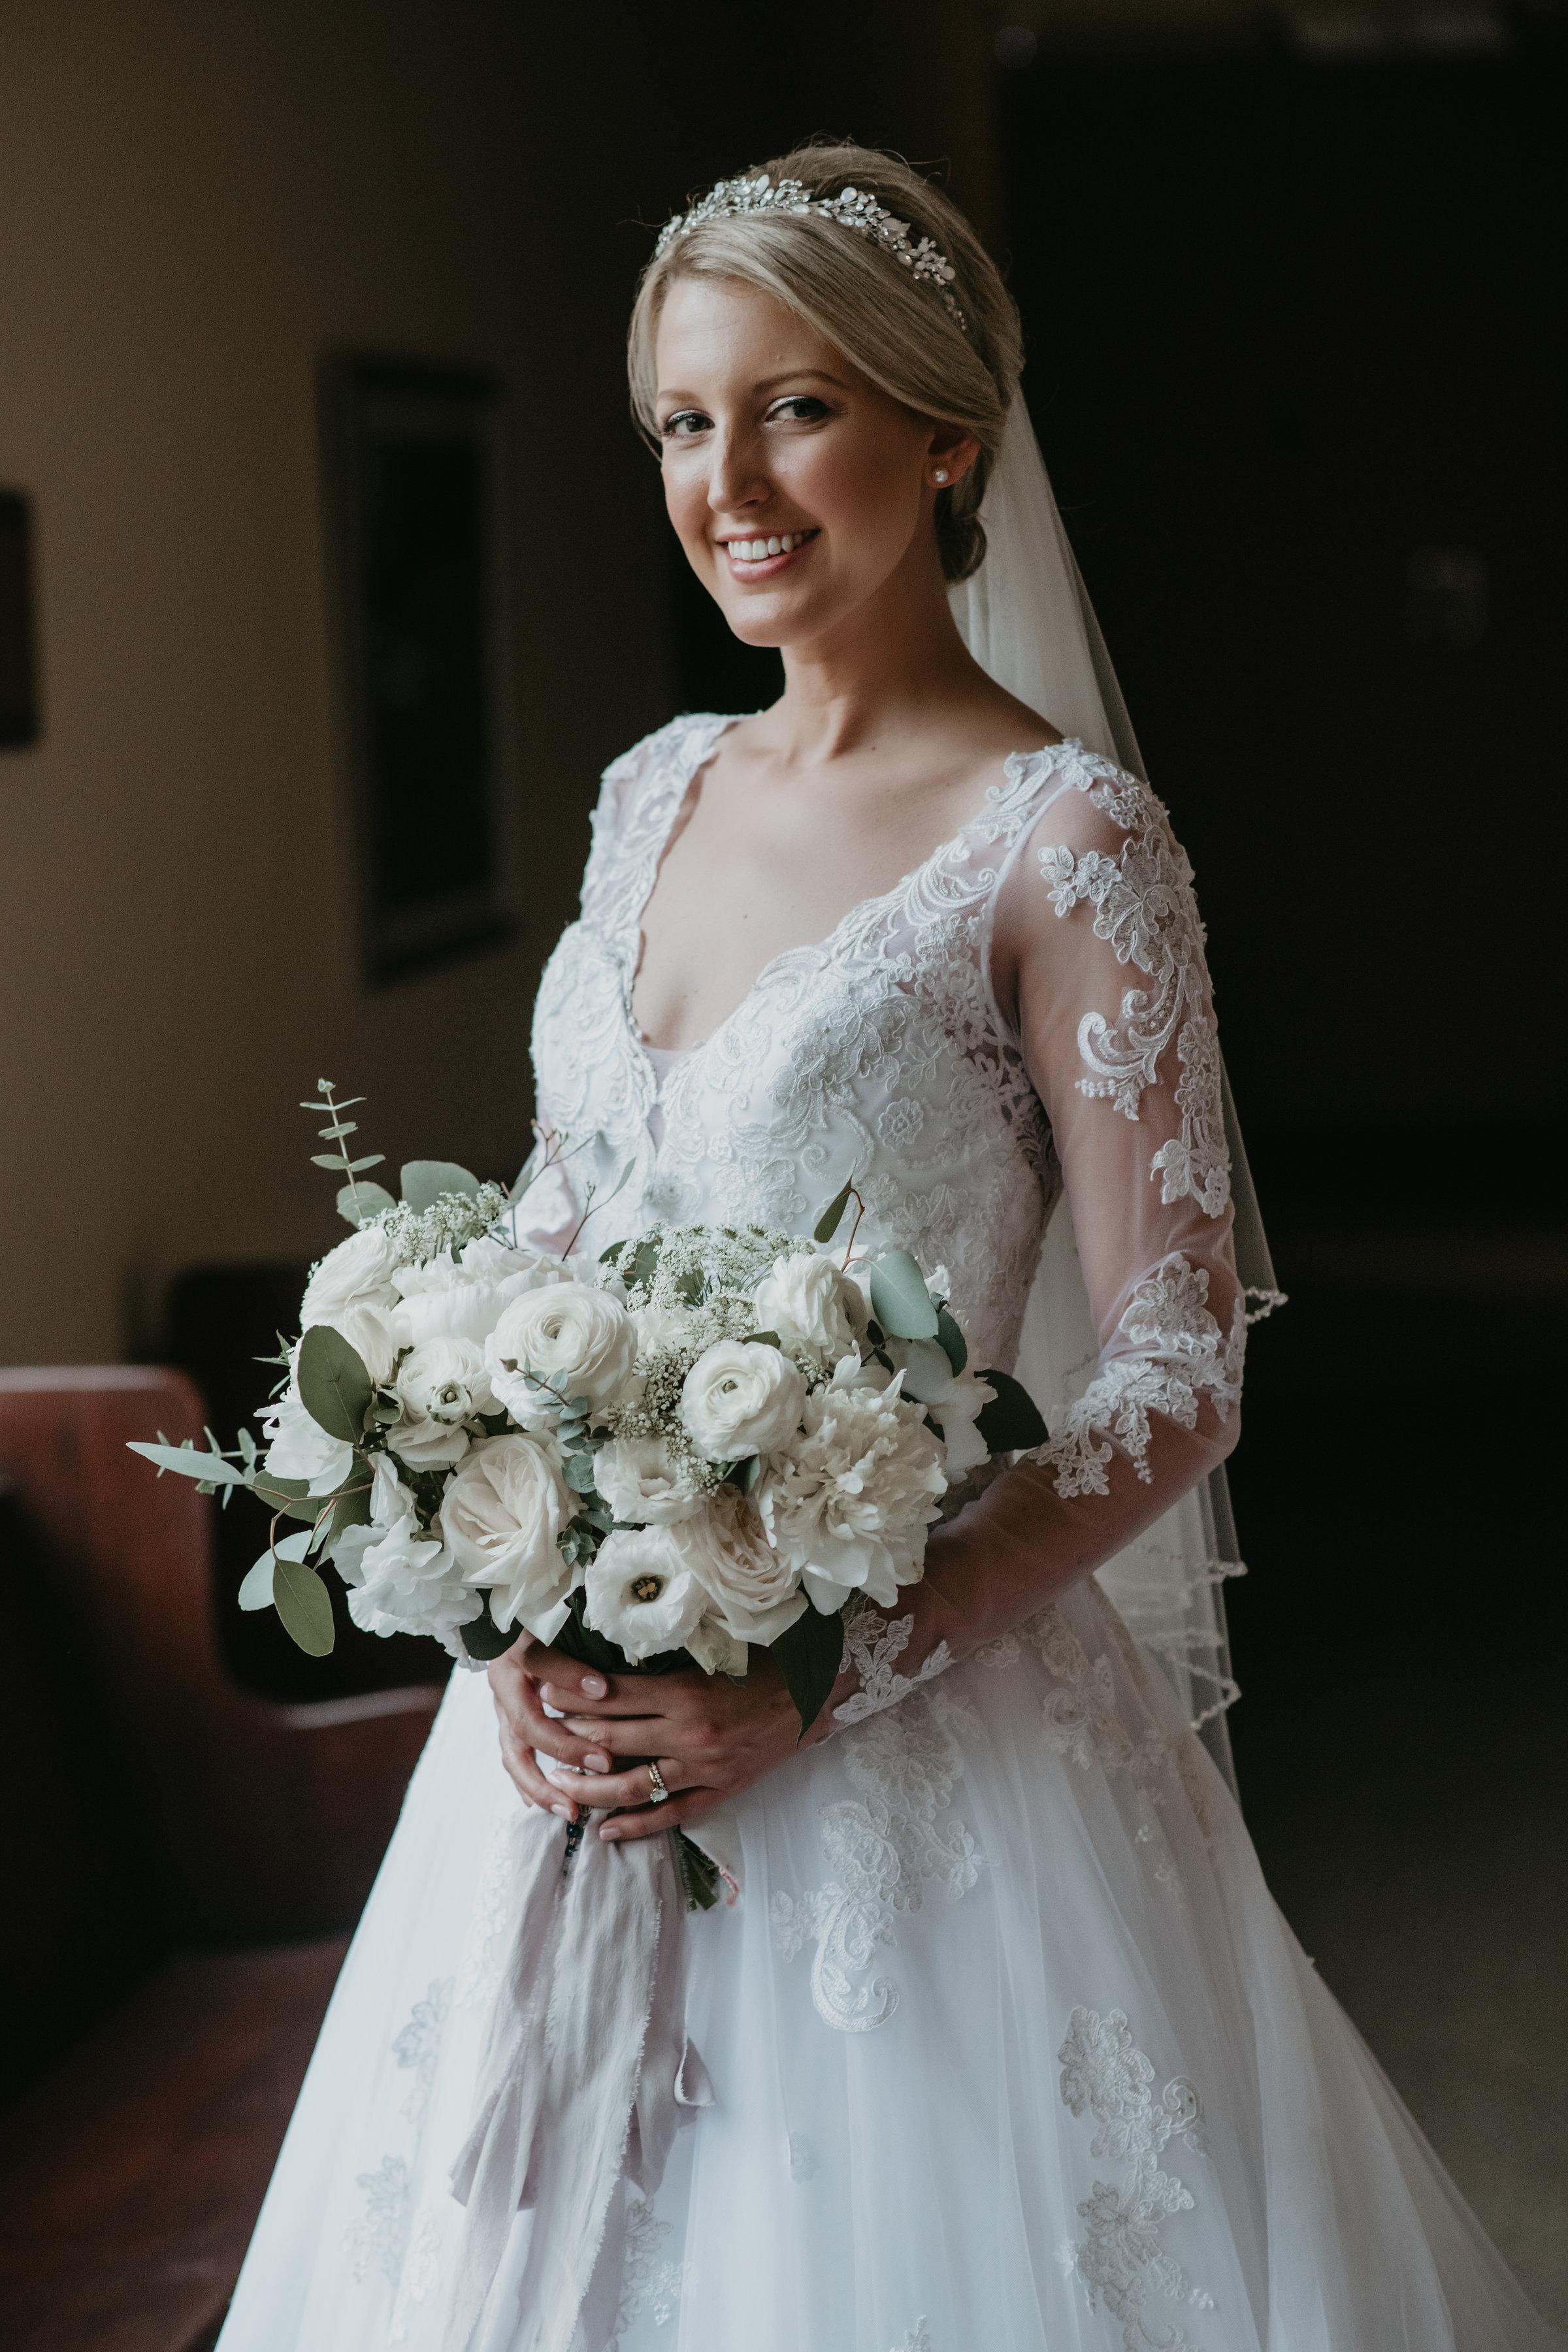 Patterson_Wedding_Bridal_Portraits_008.jpg